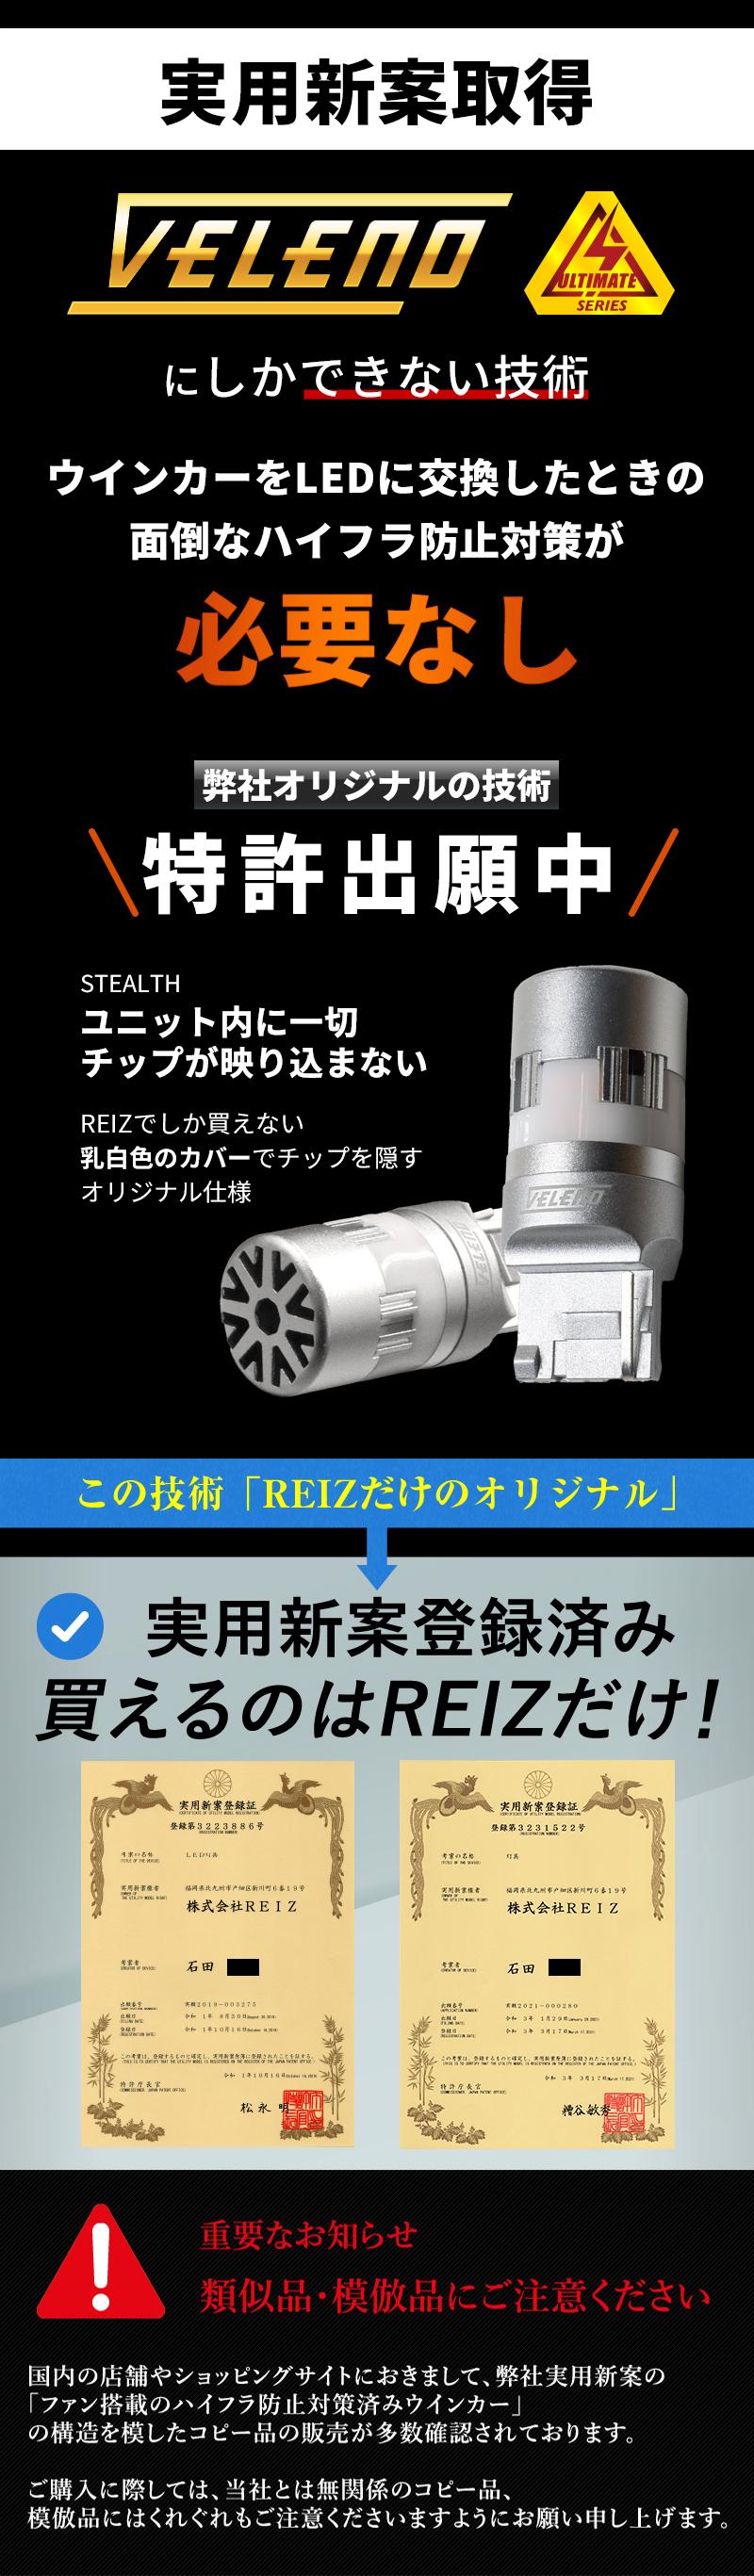 VELENO,ULTIMATE,T20,S25,LED,ウインカー,ハイフラ防止,抵抗内蔵,冷却ファン搭載,実測値,1080lm,ステルスバルブ,12V,車検対応,1年保証,送料無料